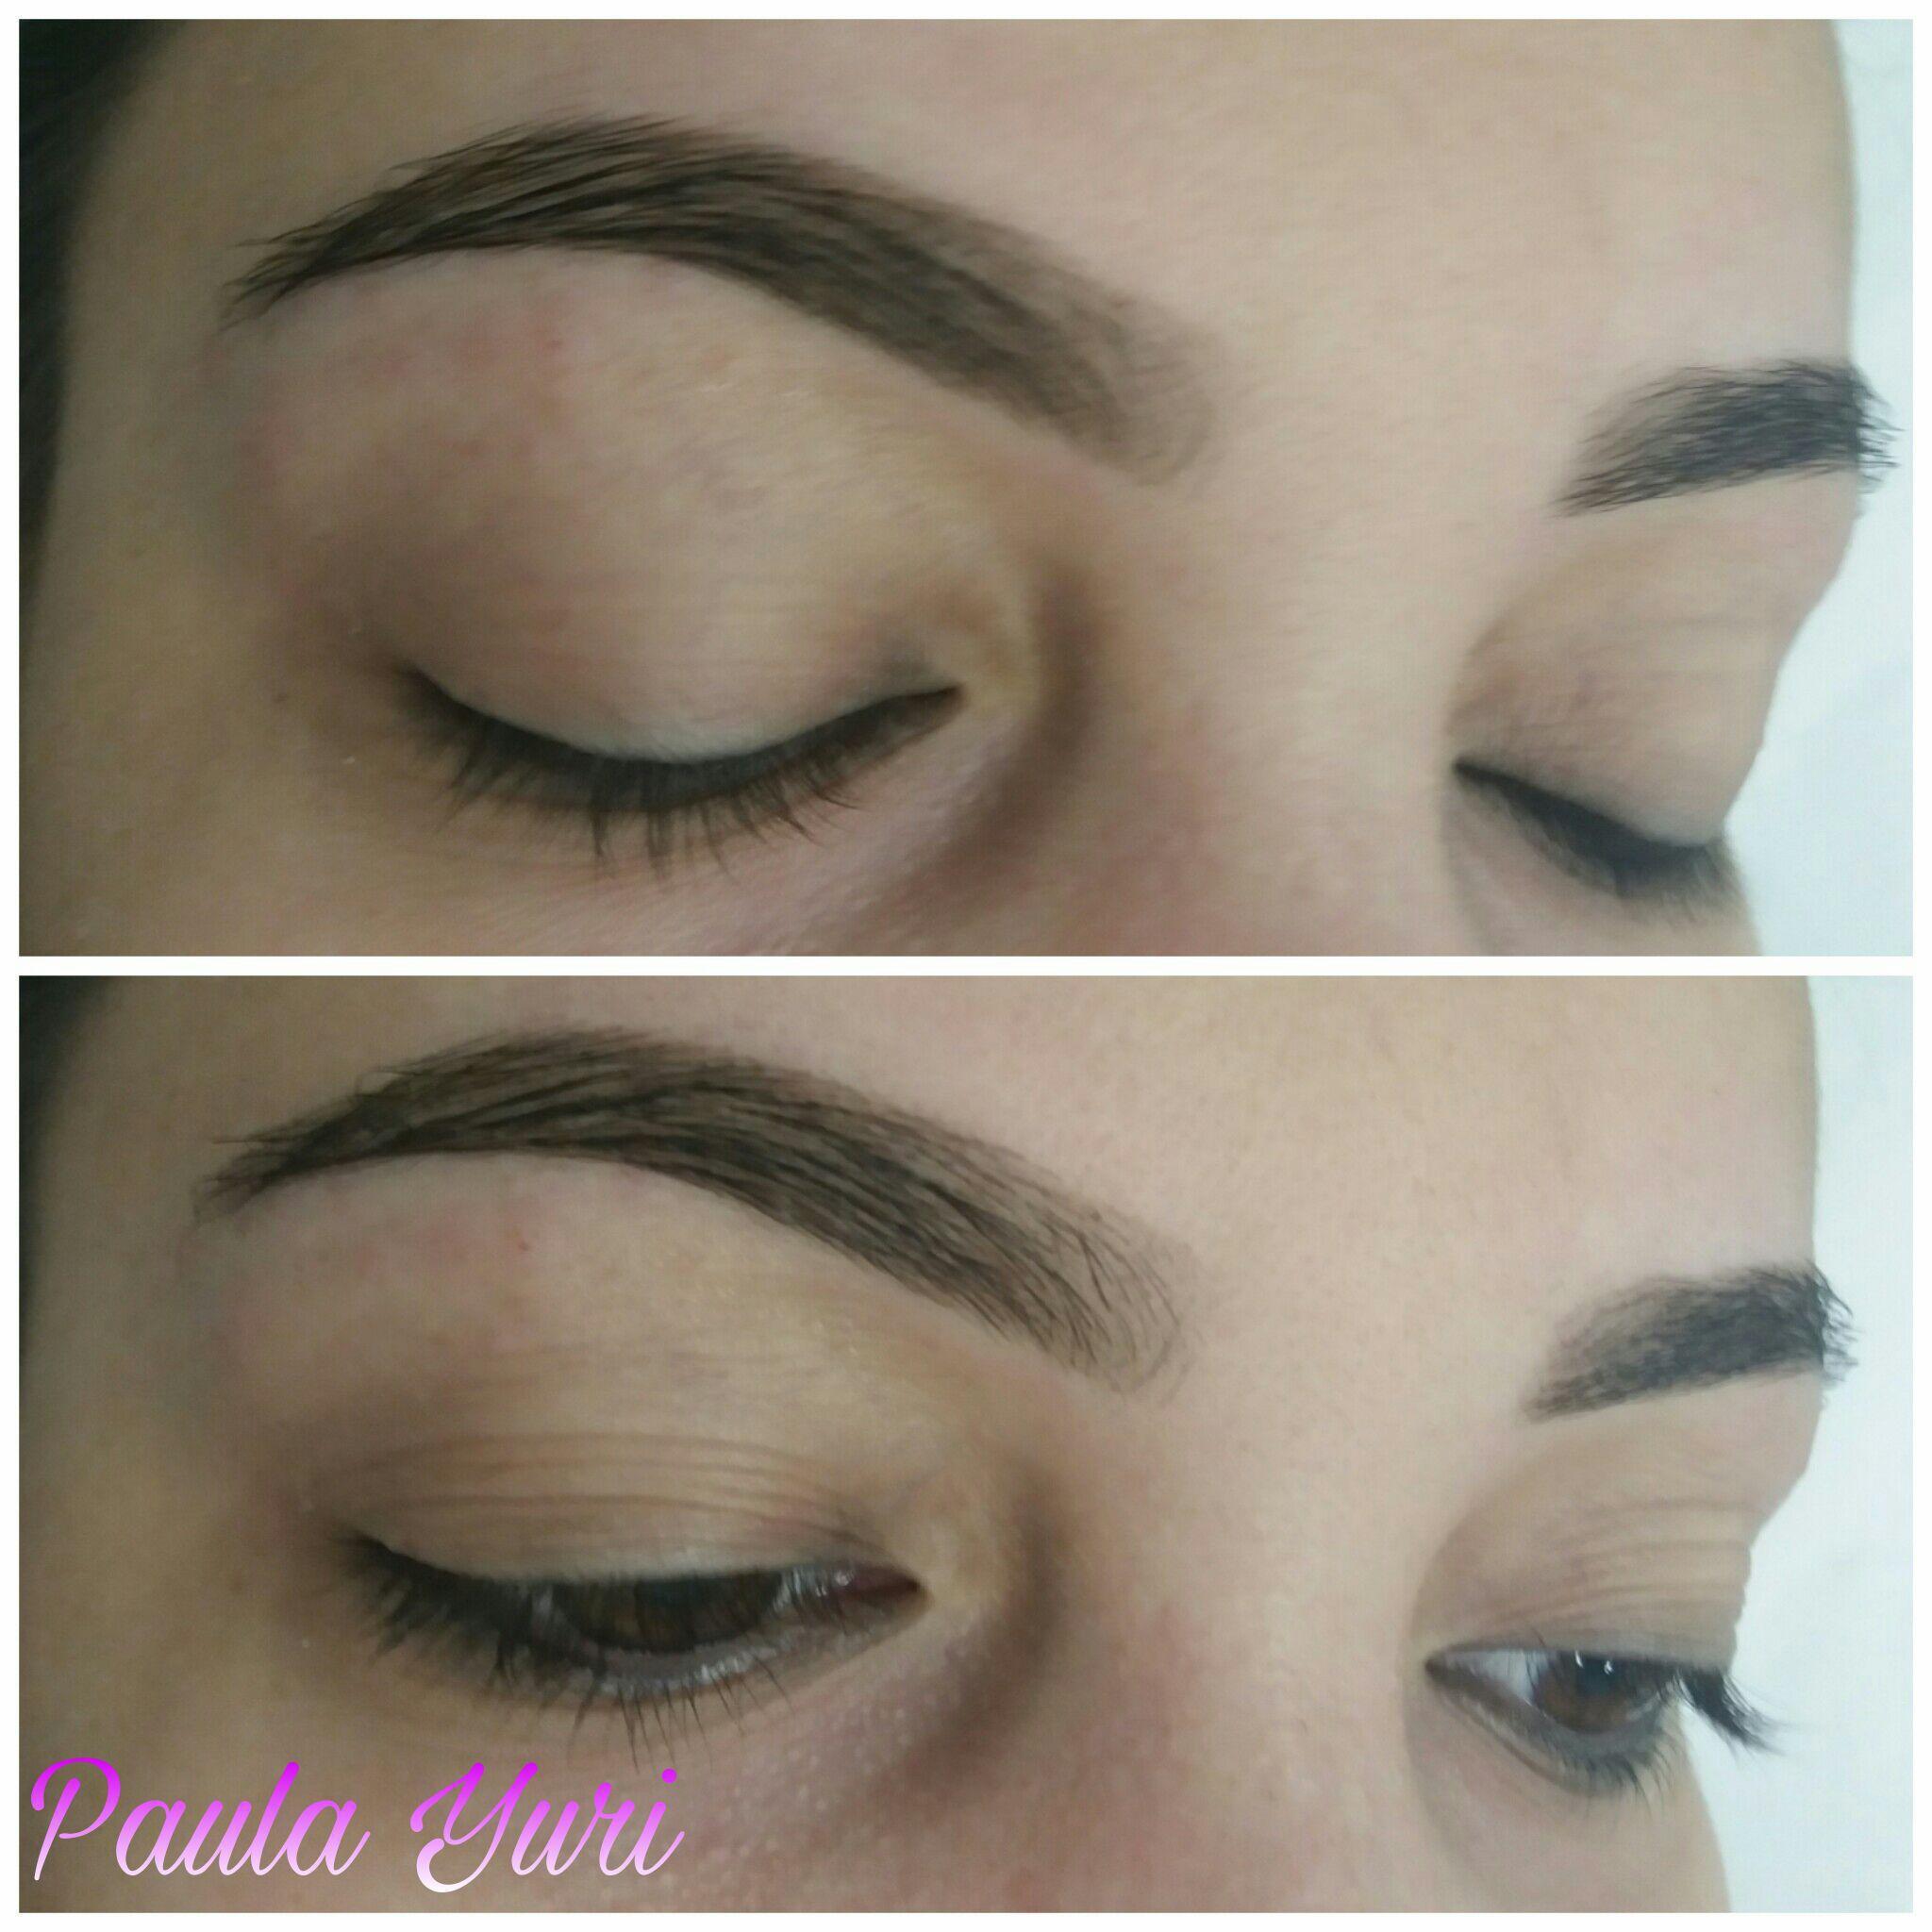 outros esteticista maquiador(a) assistente esteticista auxiliar cabeleireiro(a) designer de sobrancelhas manicure e pedicure estudante (esteticista)